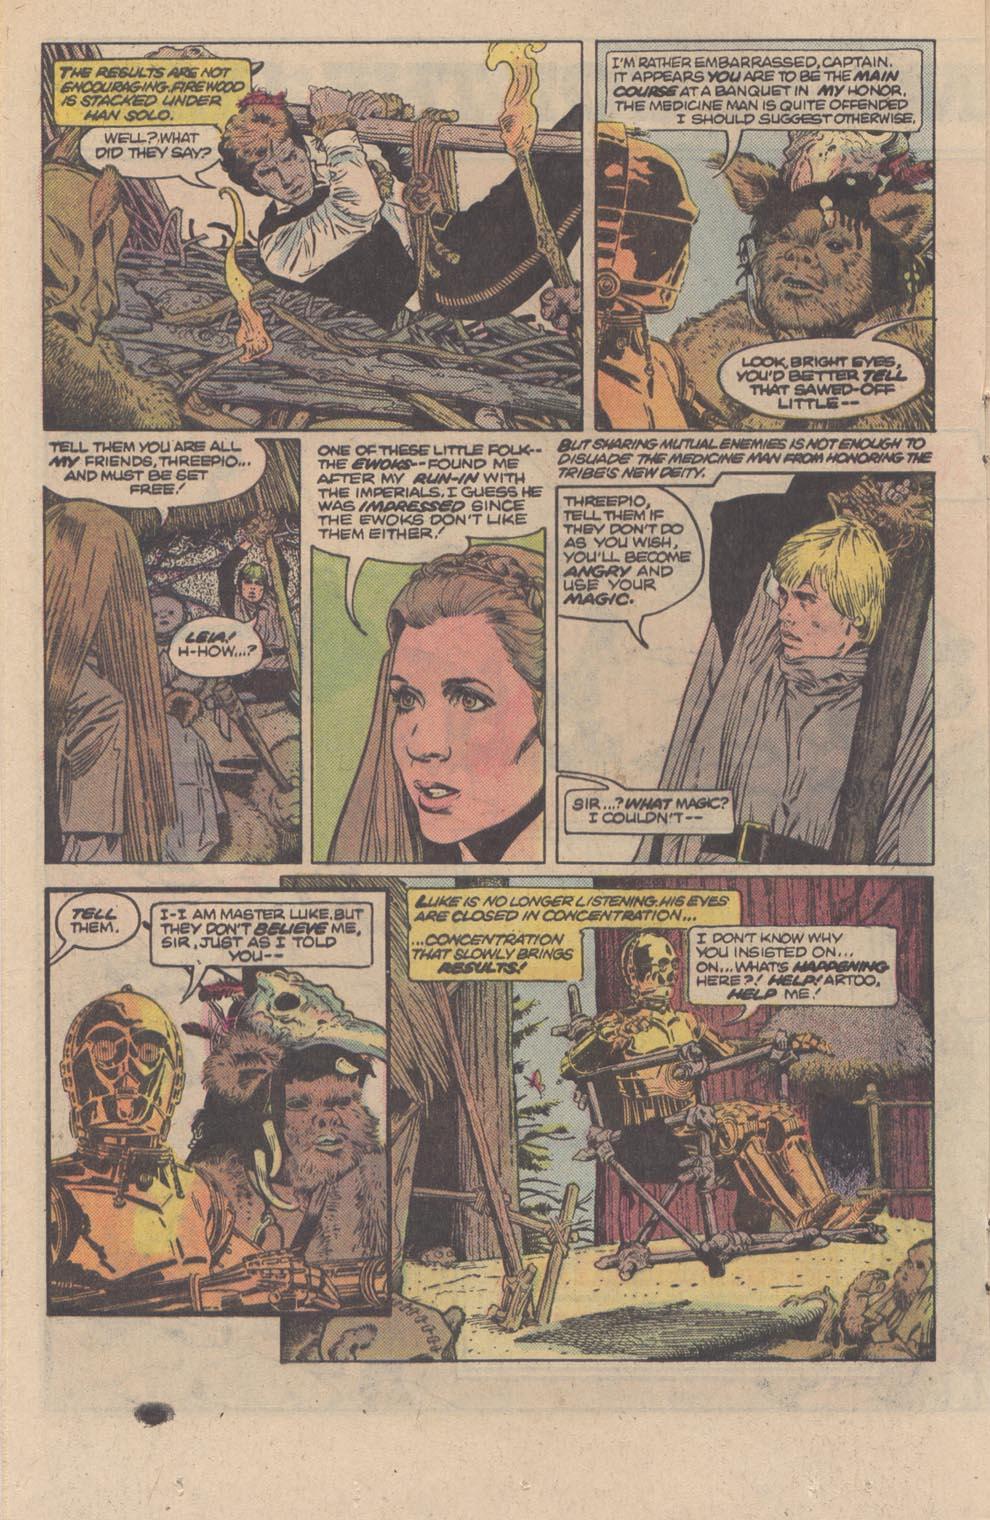 Comic Star Wars: Return of the Jedi issue 3